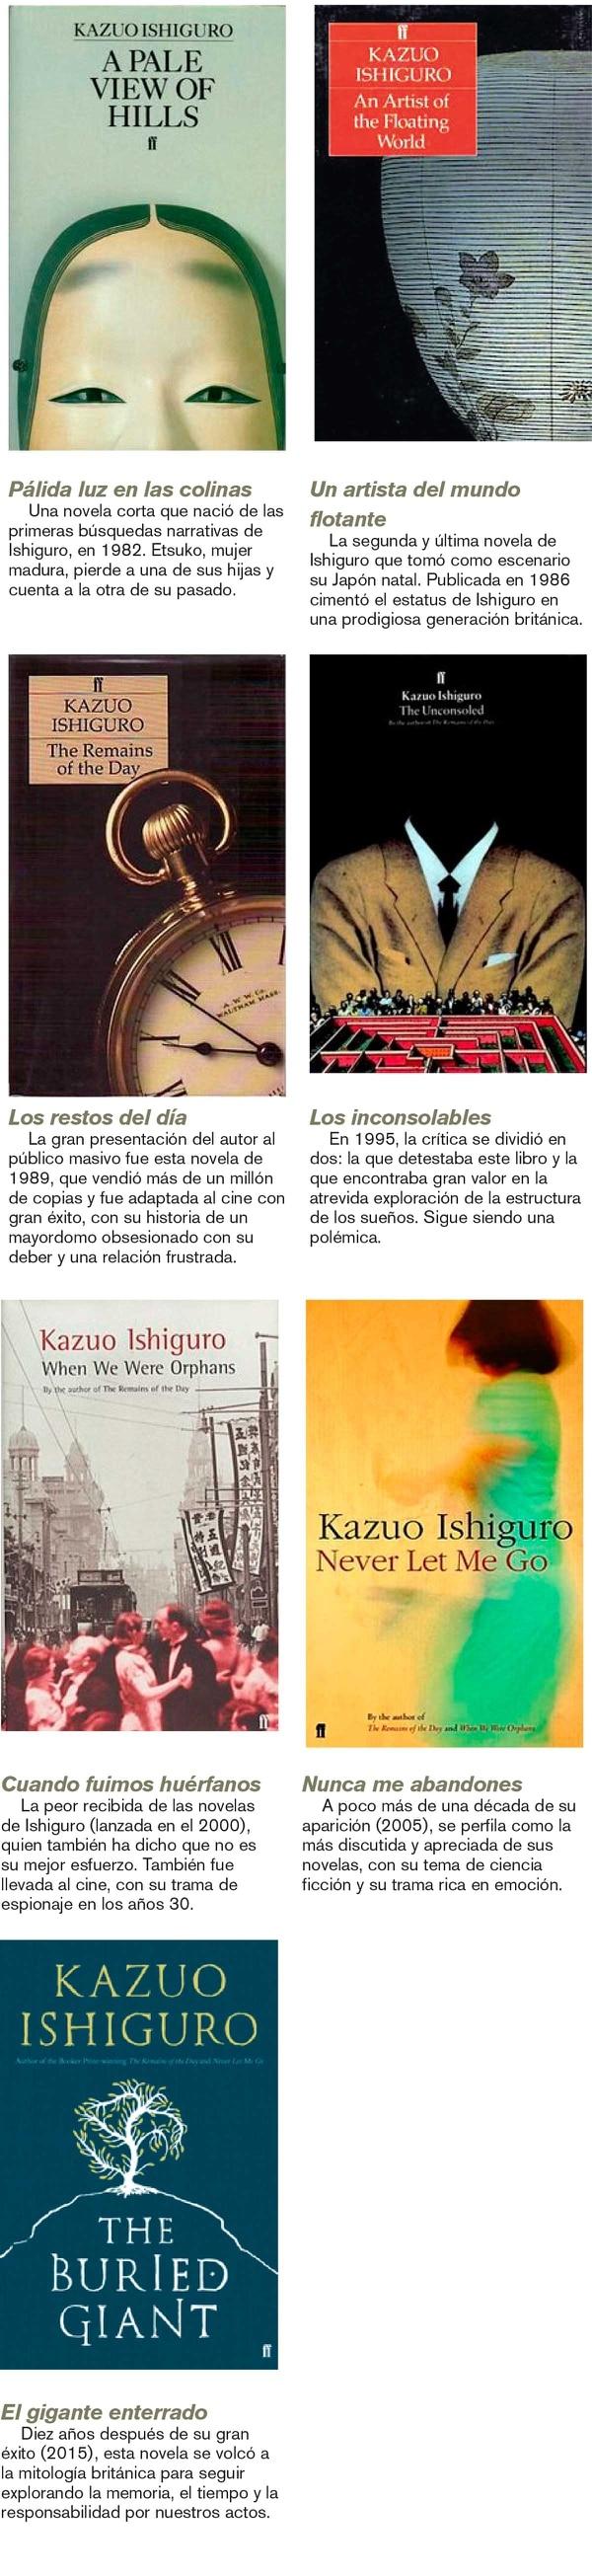 Libros de escritor Kazuo Ishiguro